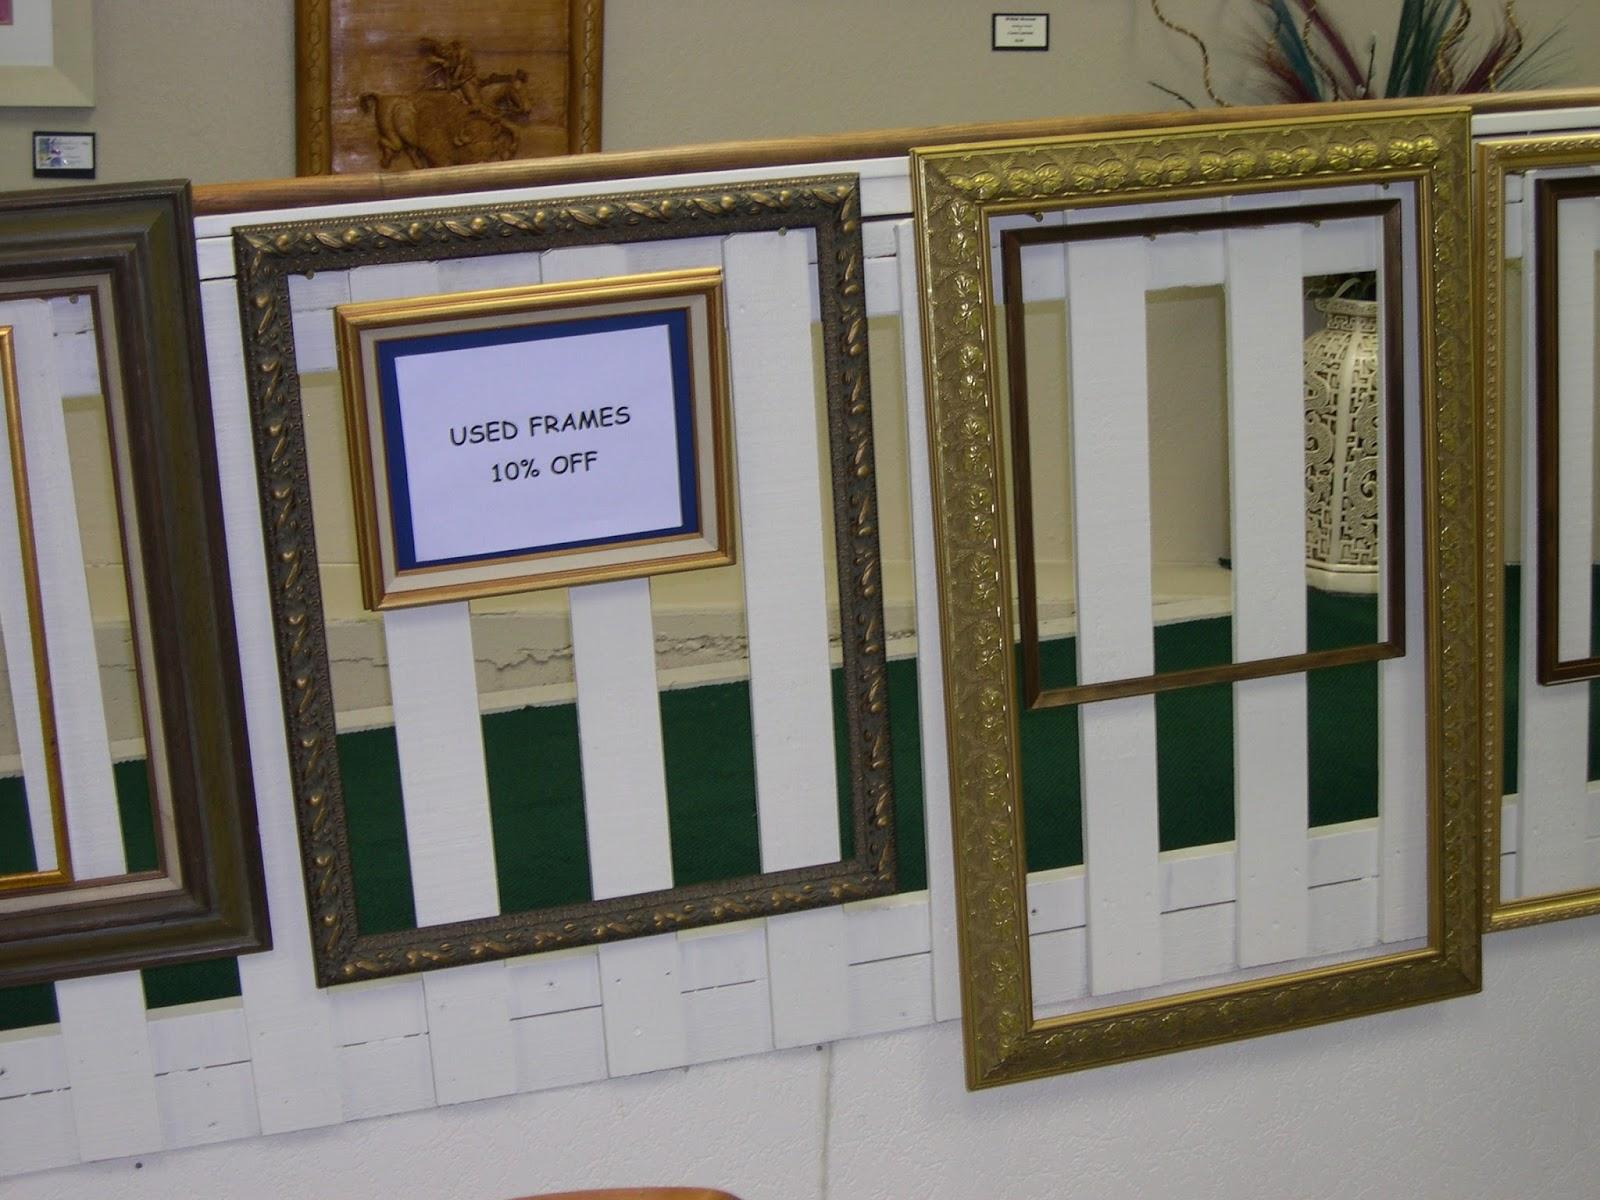 Ye Olde Art Shoppe: Frame Sale